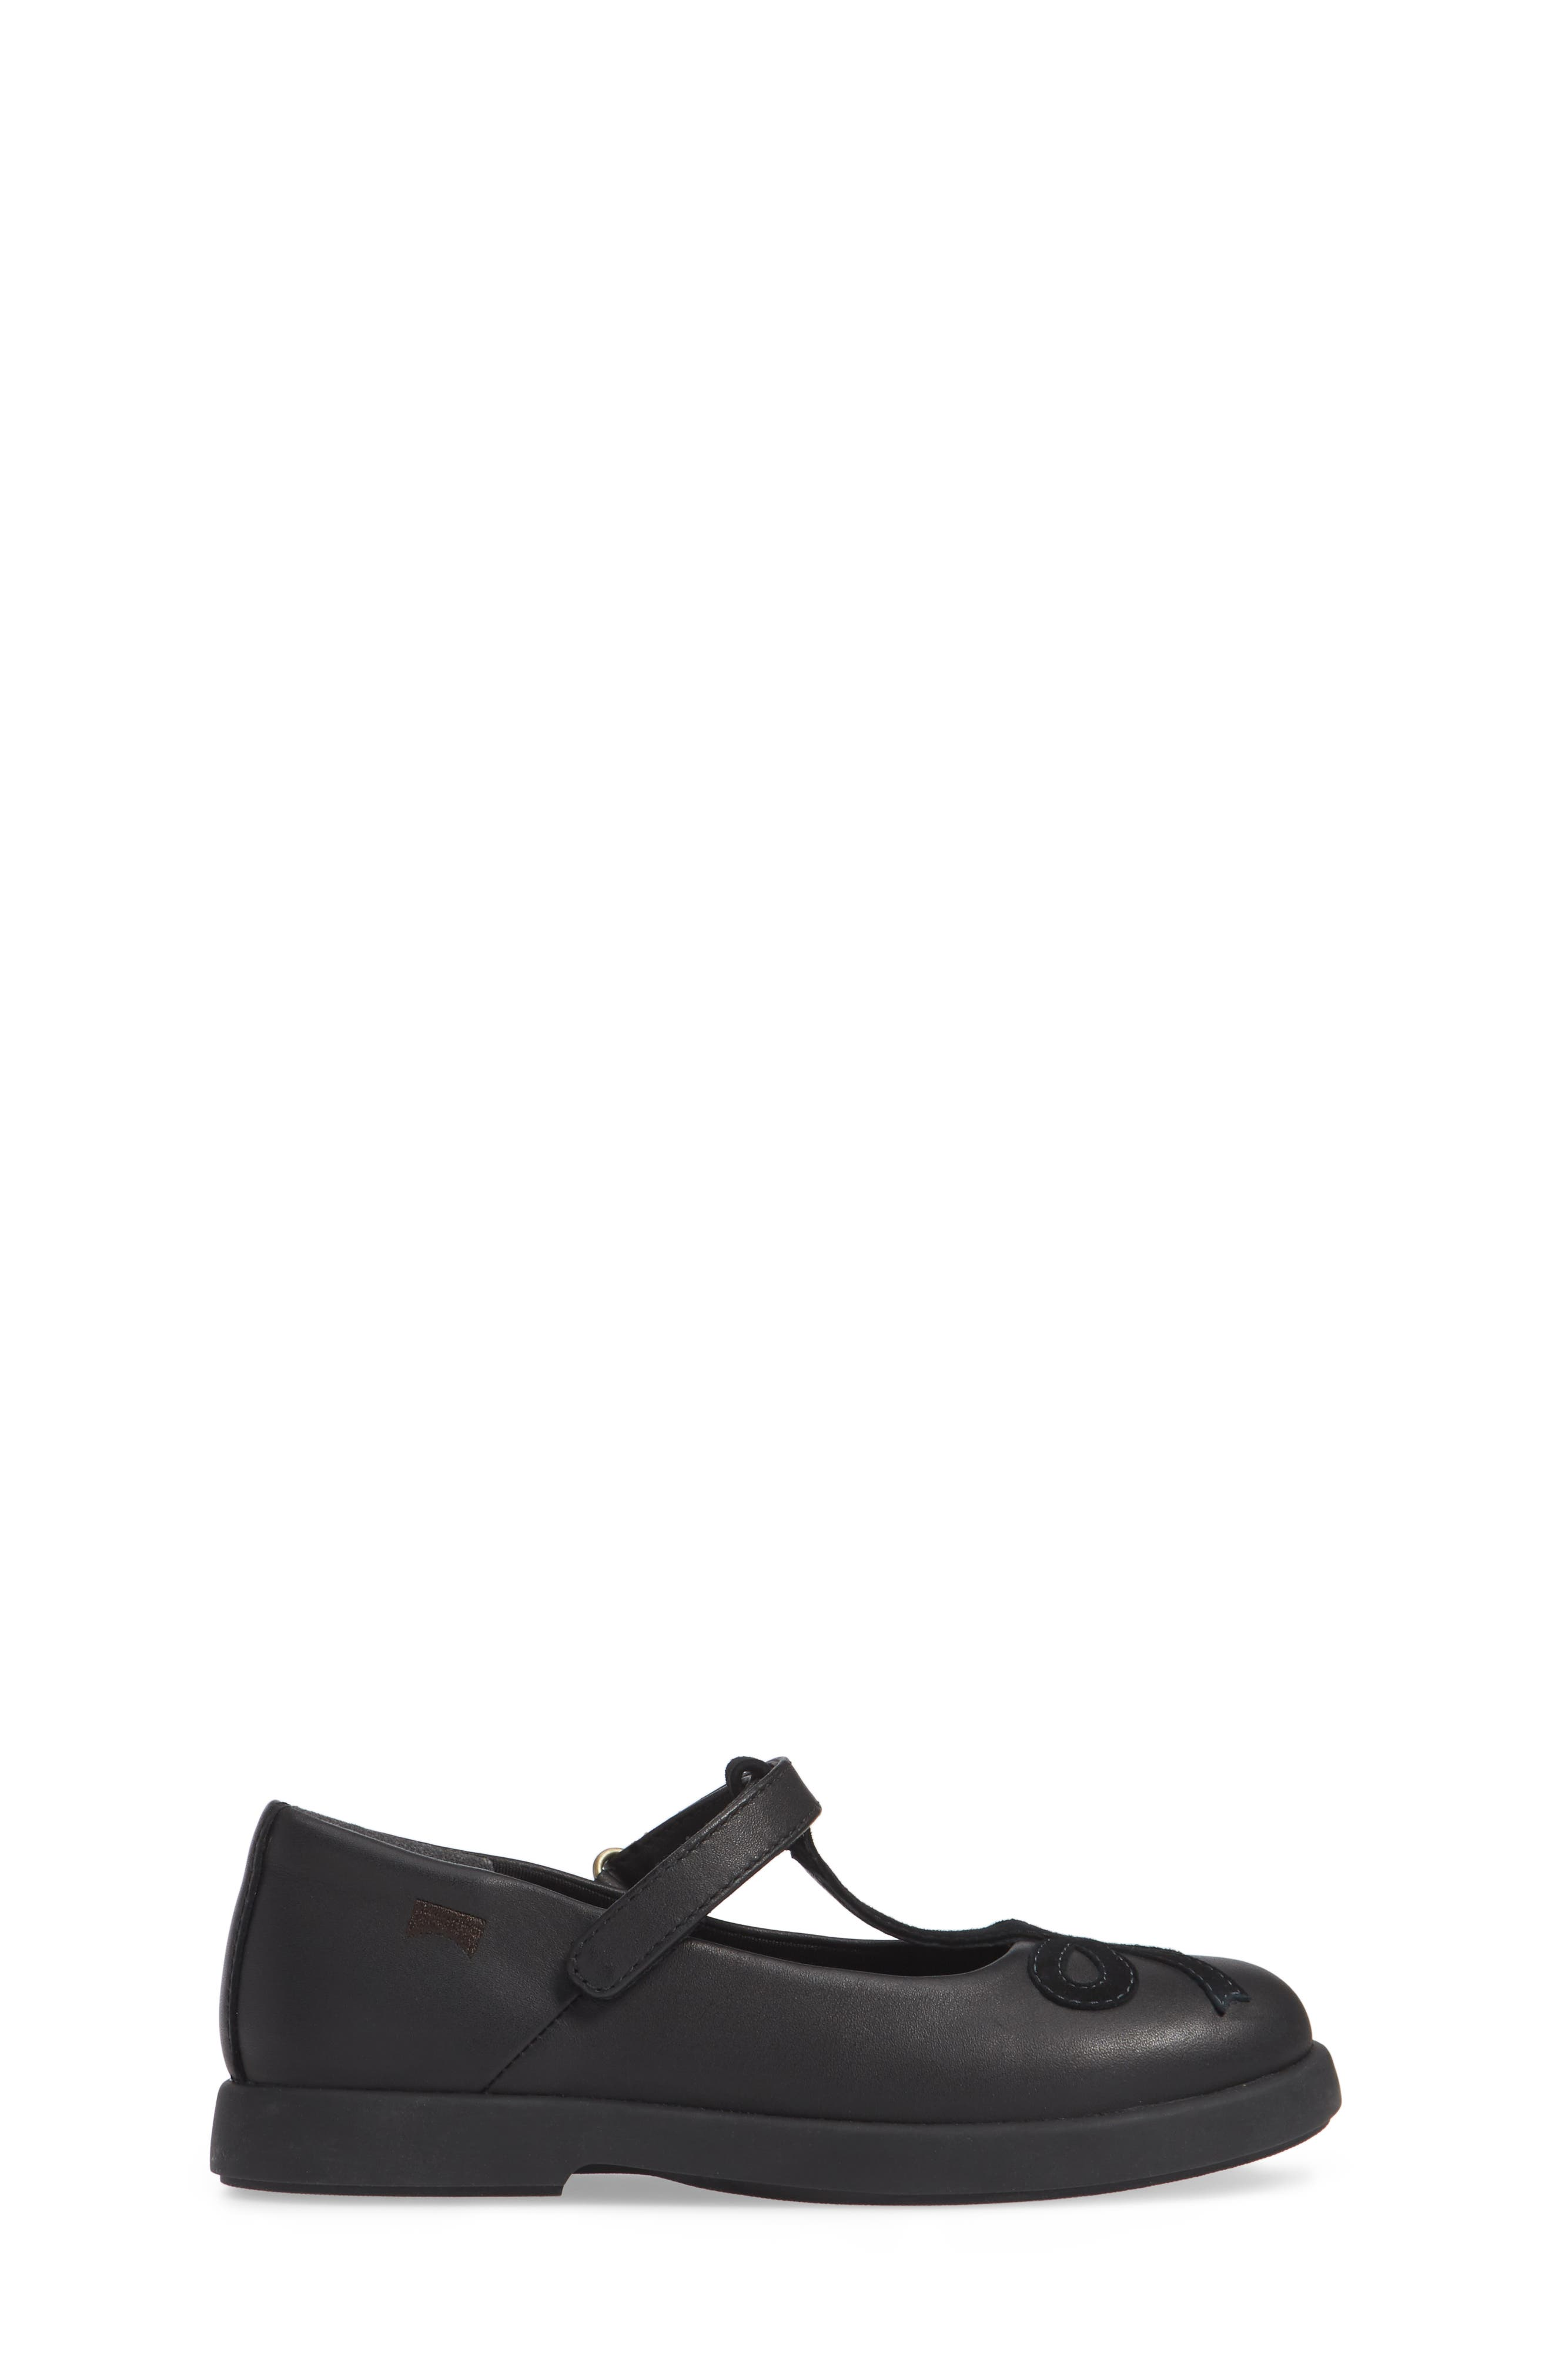 Twins Mary Jane Shoe,                             Alternate thumbnail 3, color,                             BLACK